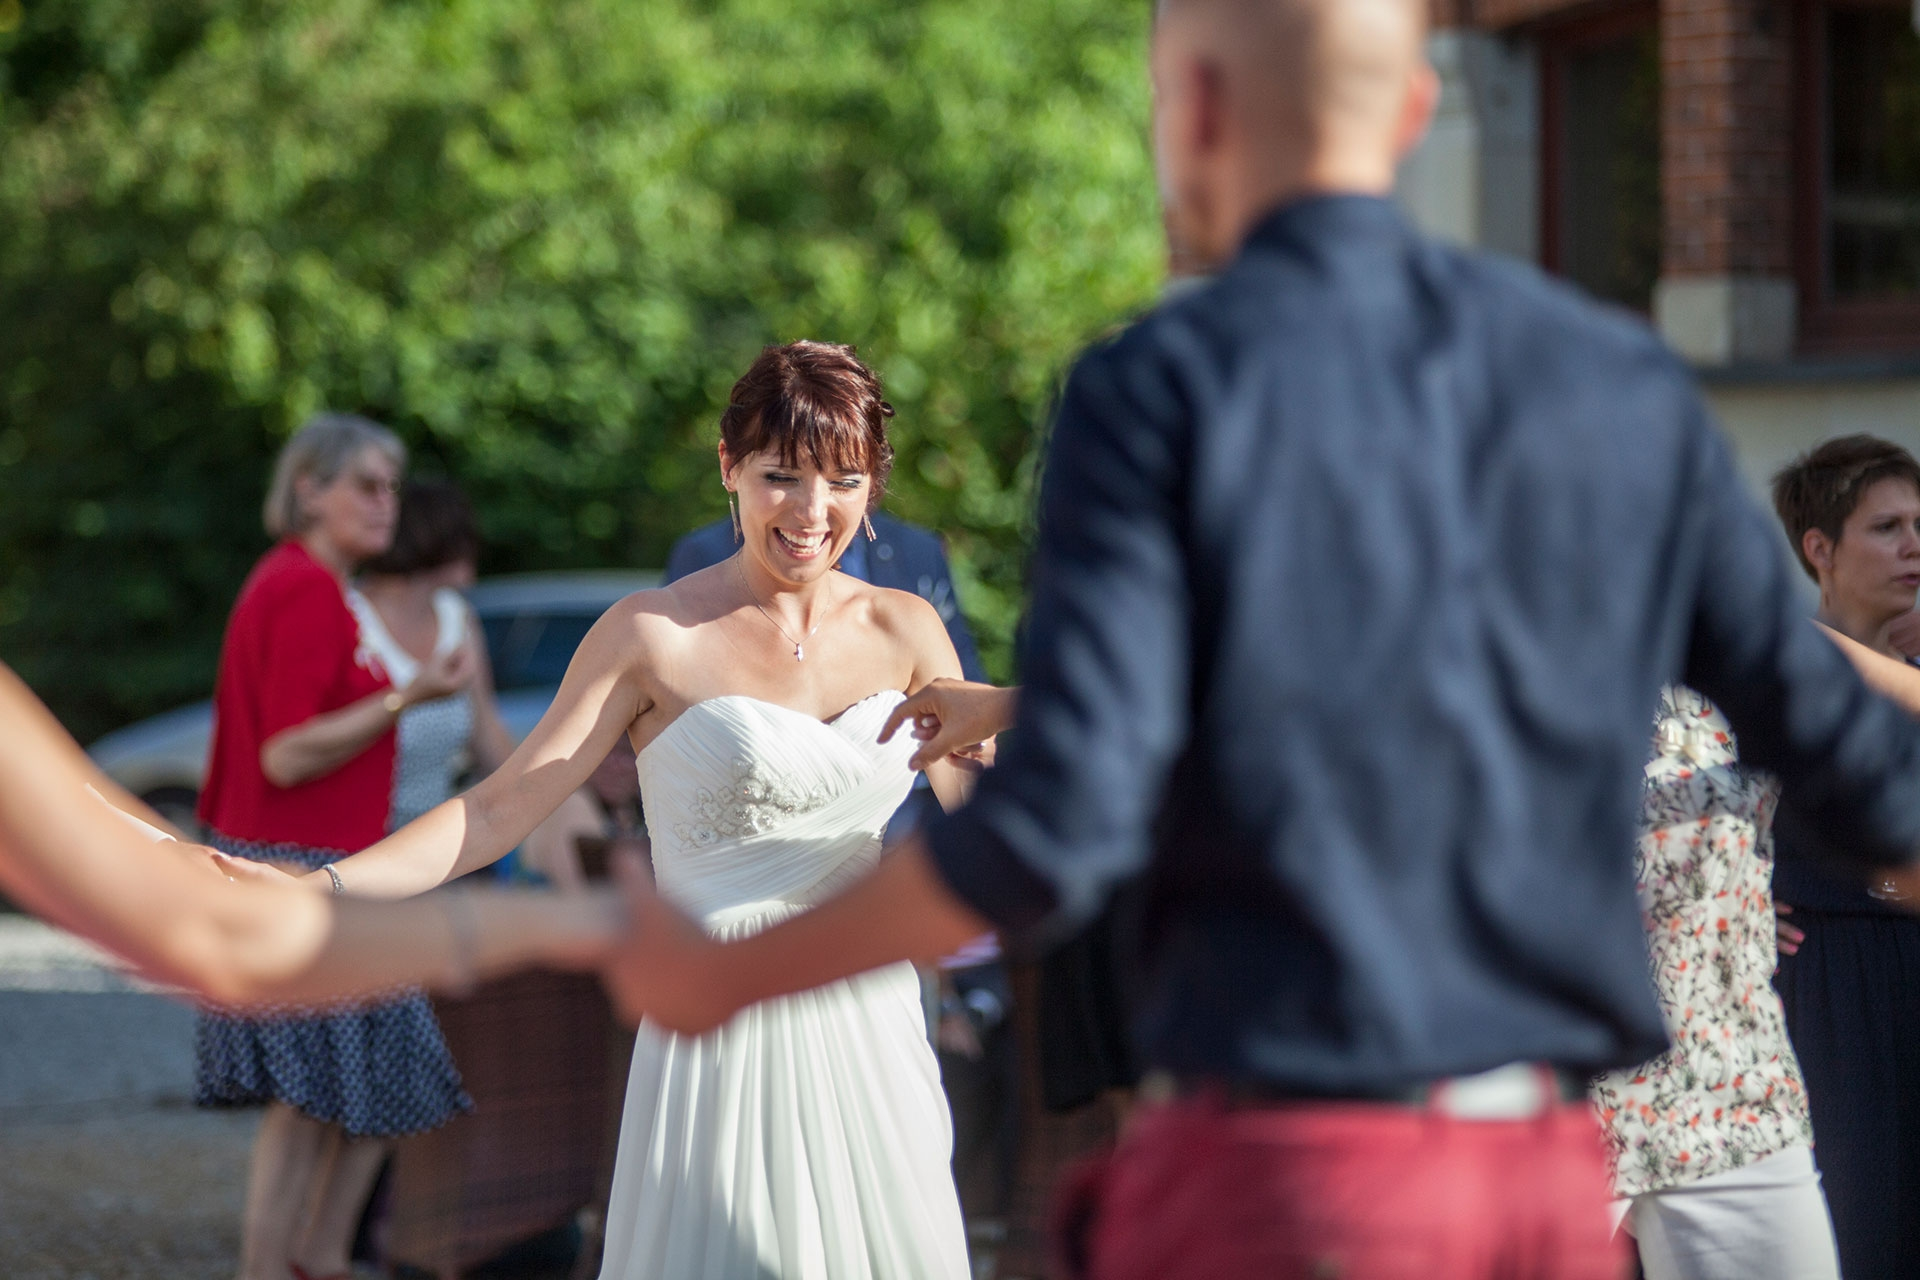 particuliers-evenements-mariages-oui-aurelie&geoffrey-37